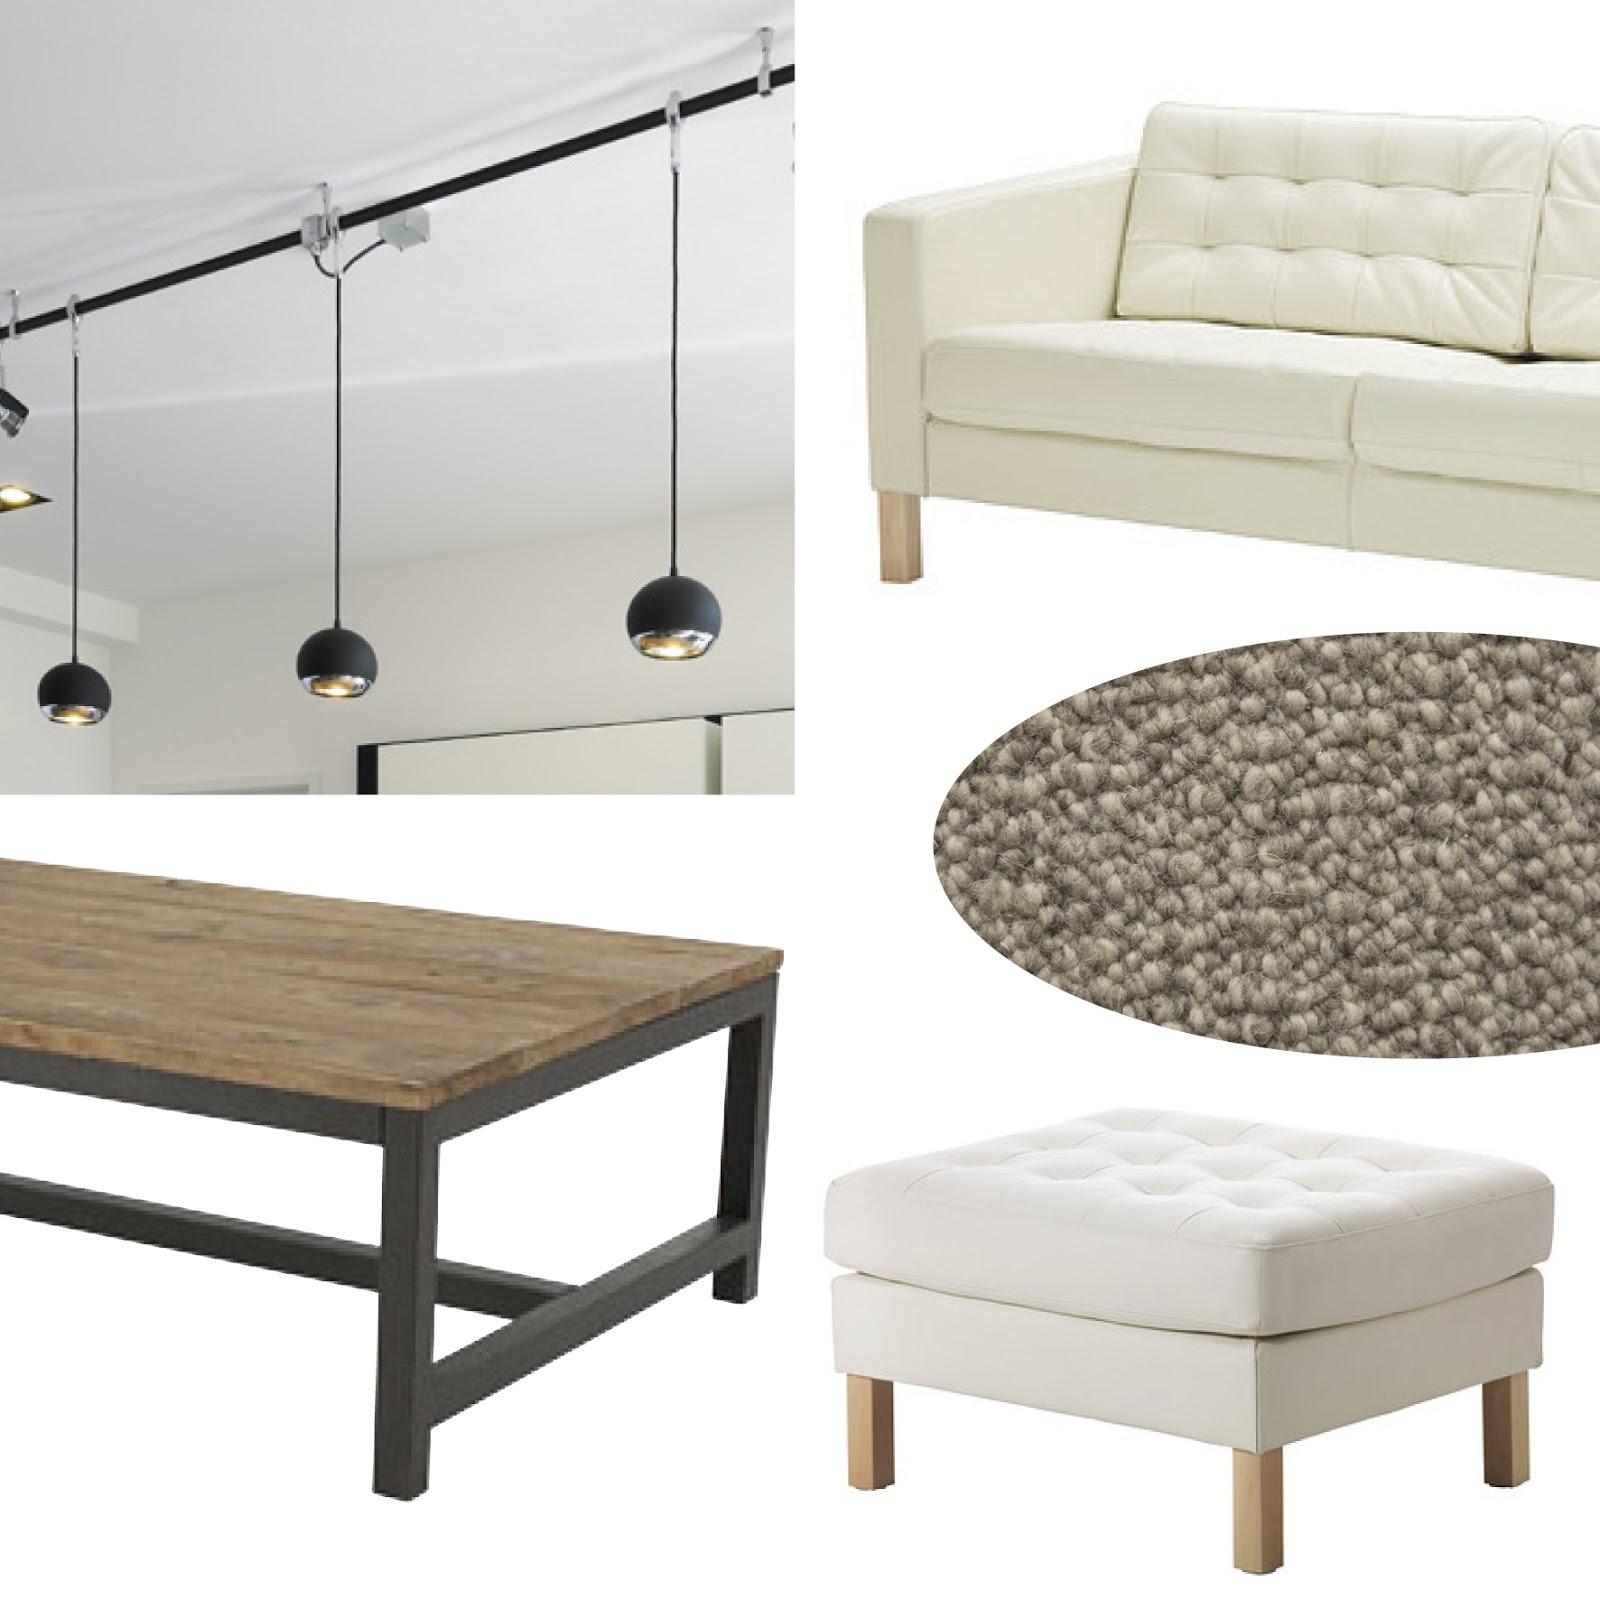 Interiørideer stue og spisestue